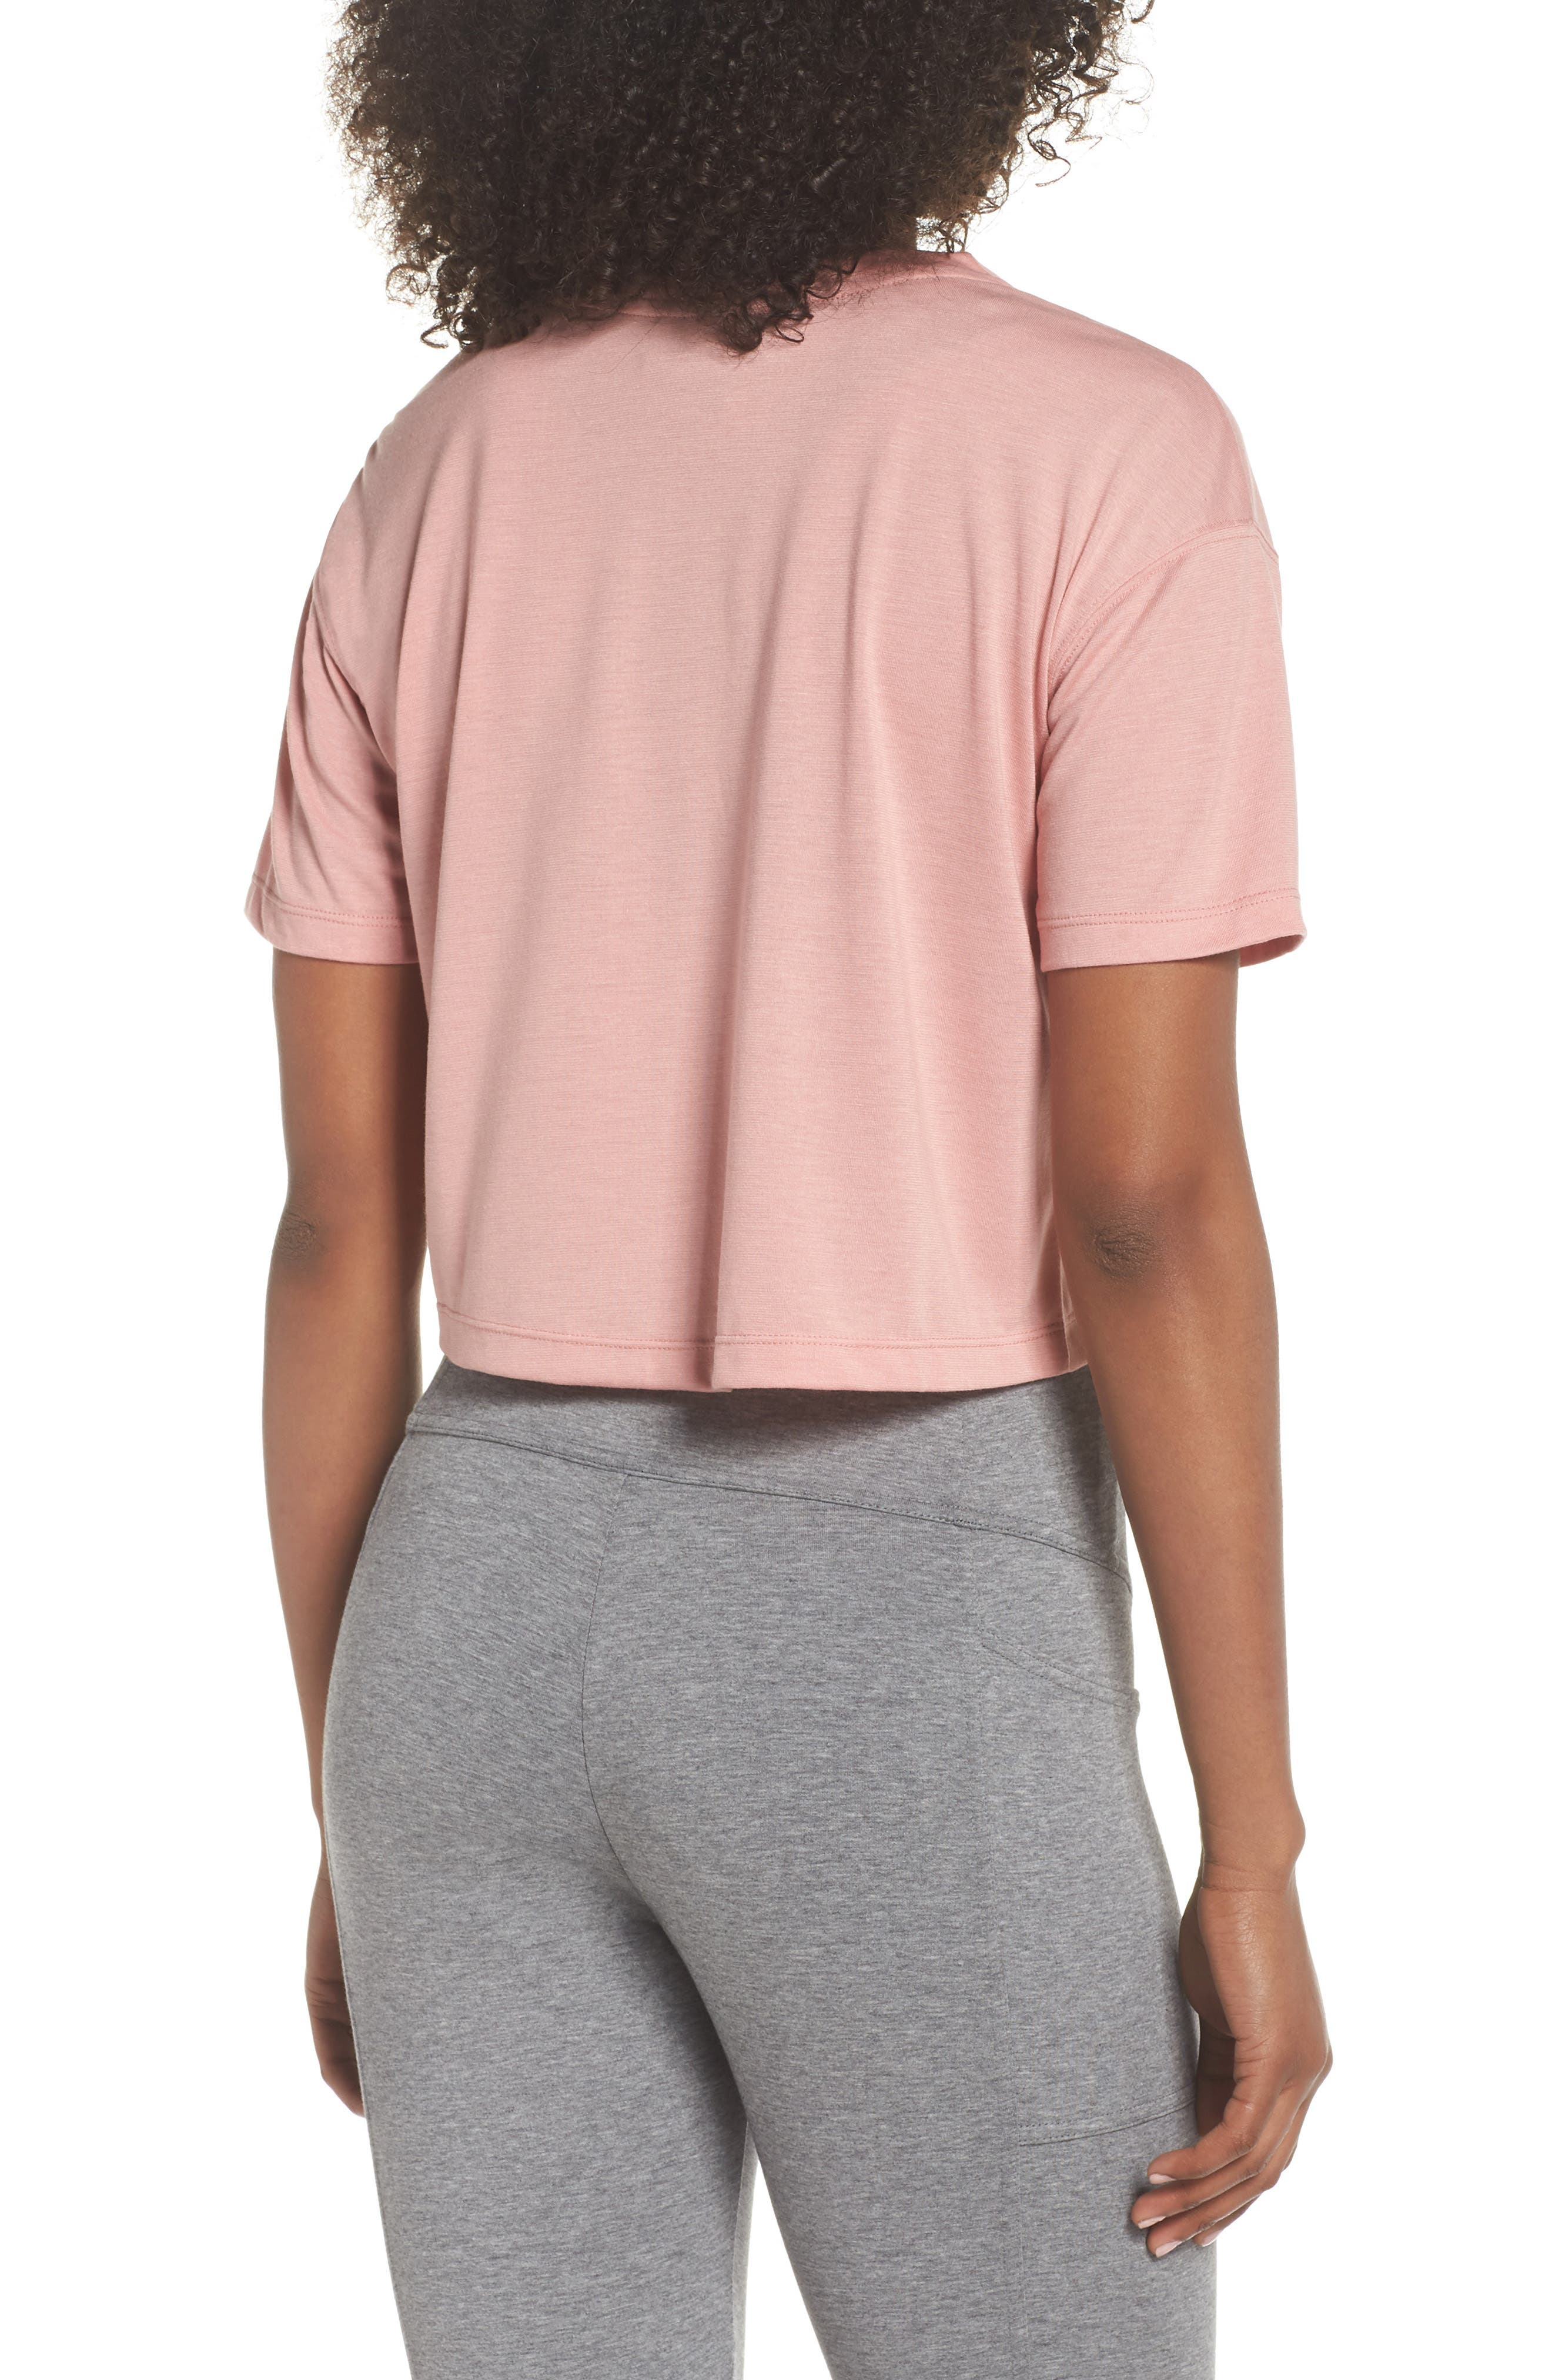 Sportswear Crop Top,                             Alternate thumbnail 2, color,                             Rust Pink/ White